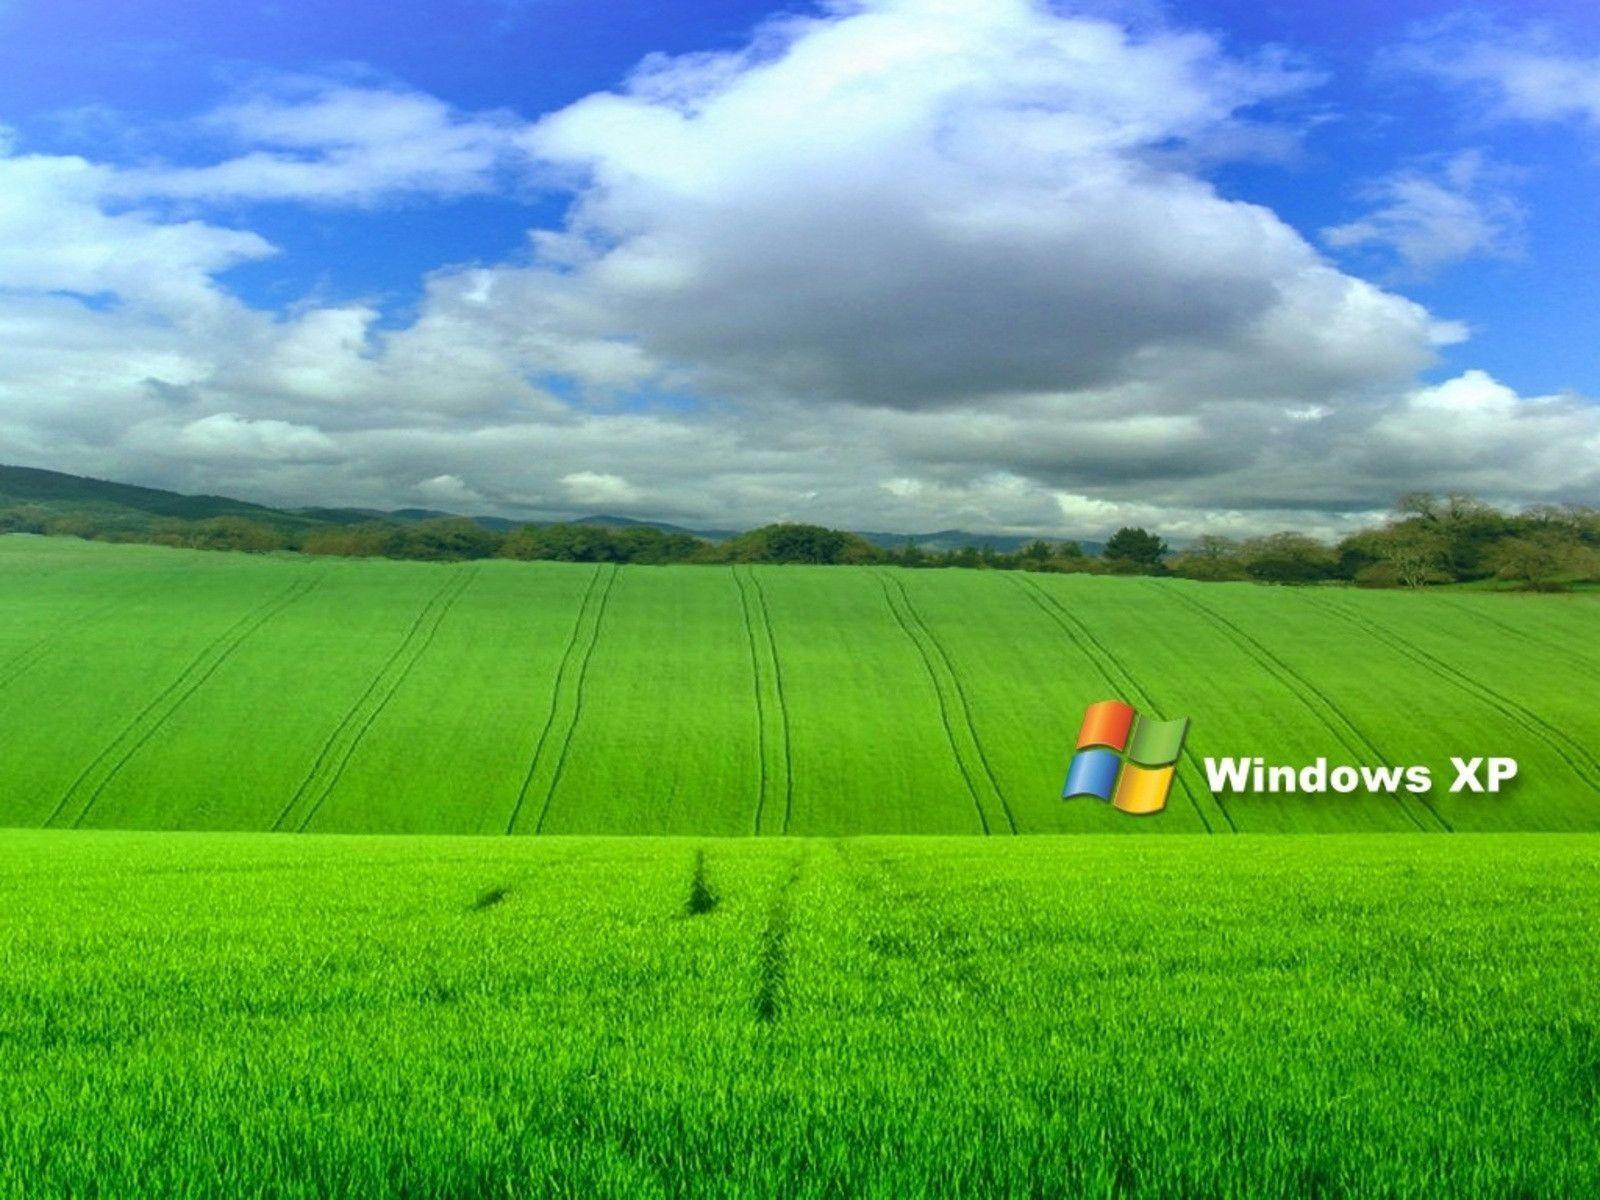 windows xp desktop backgrounds 1600a—1200 high definition download